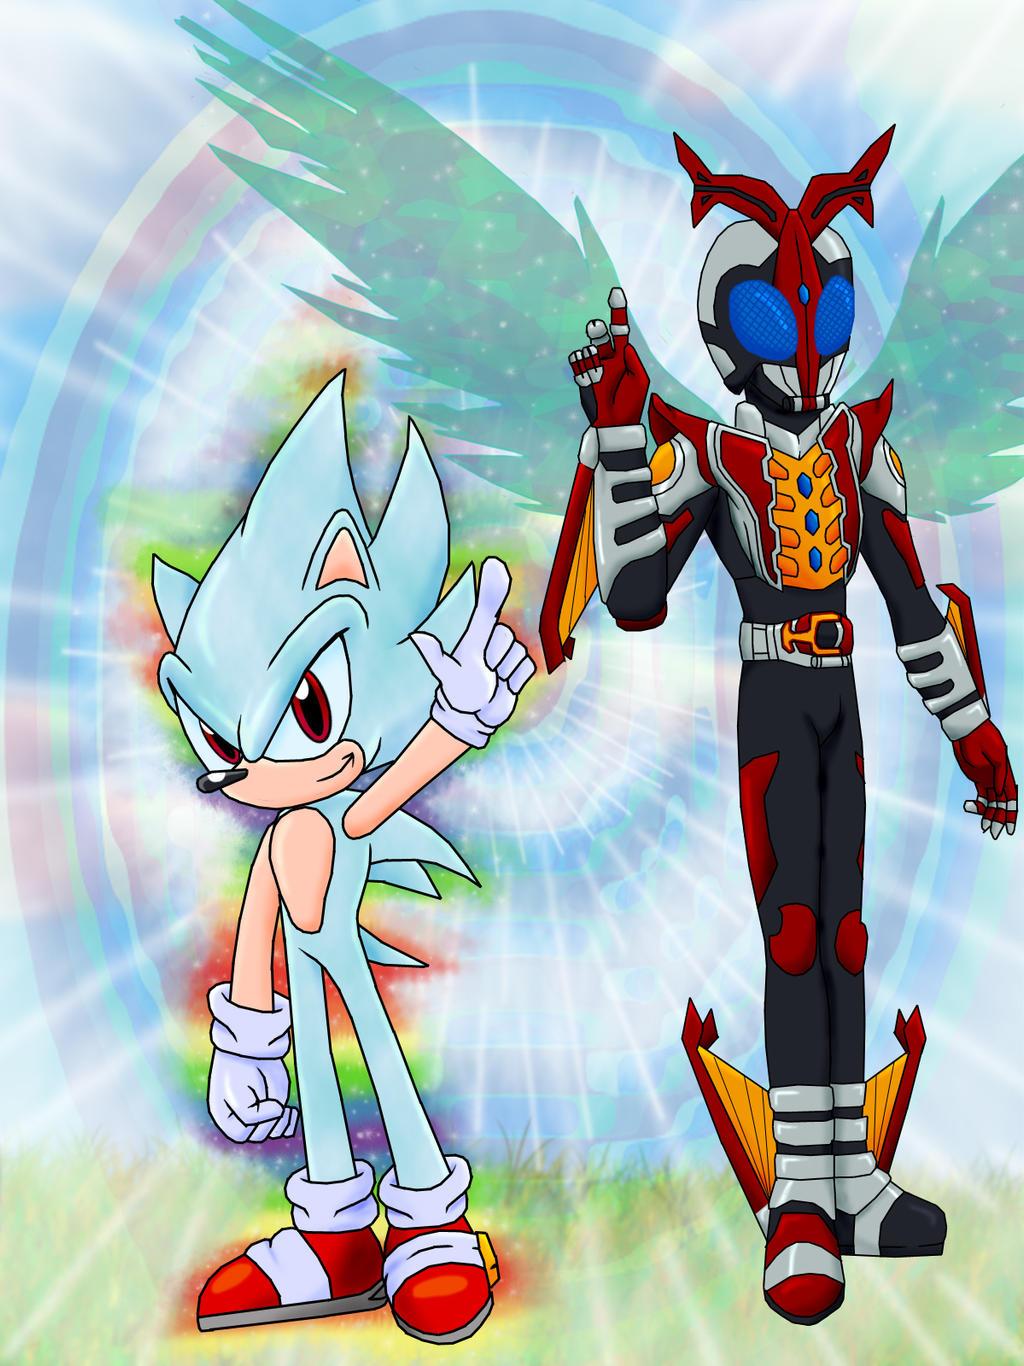 Kamen Rider Kabuto Hyper Form and Hyper Sonic by FerroKivaKamen Rider Kabuto Hyper Form